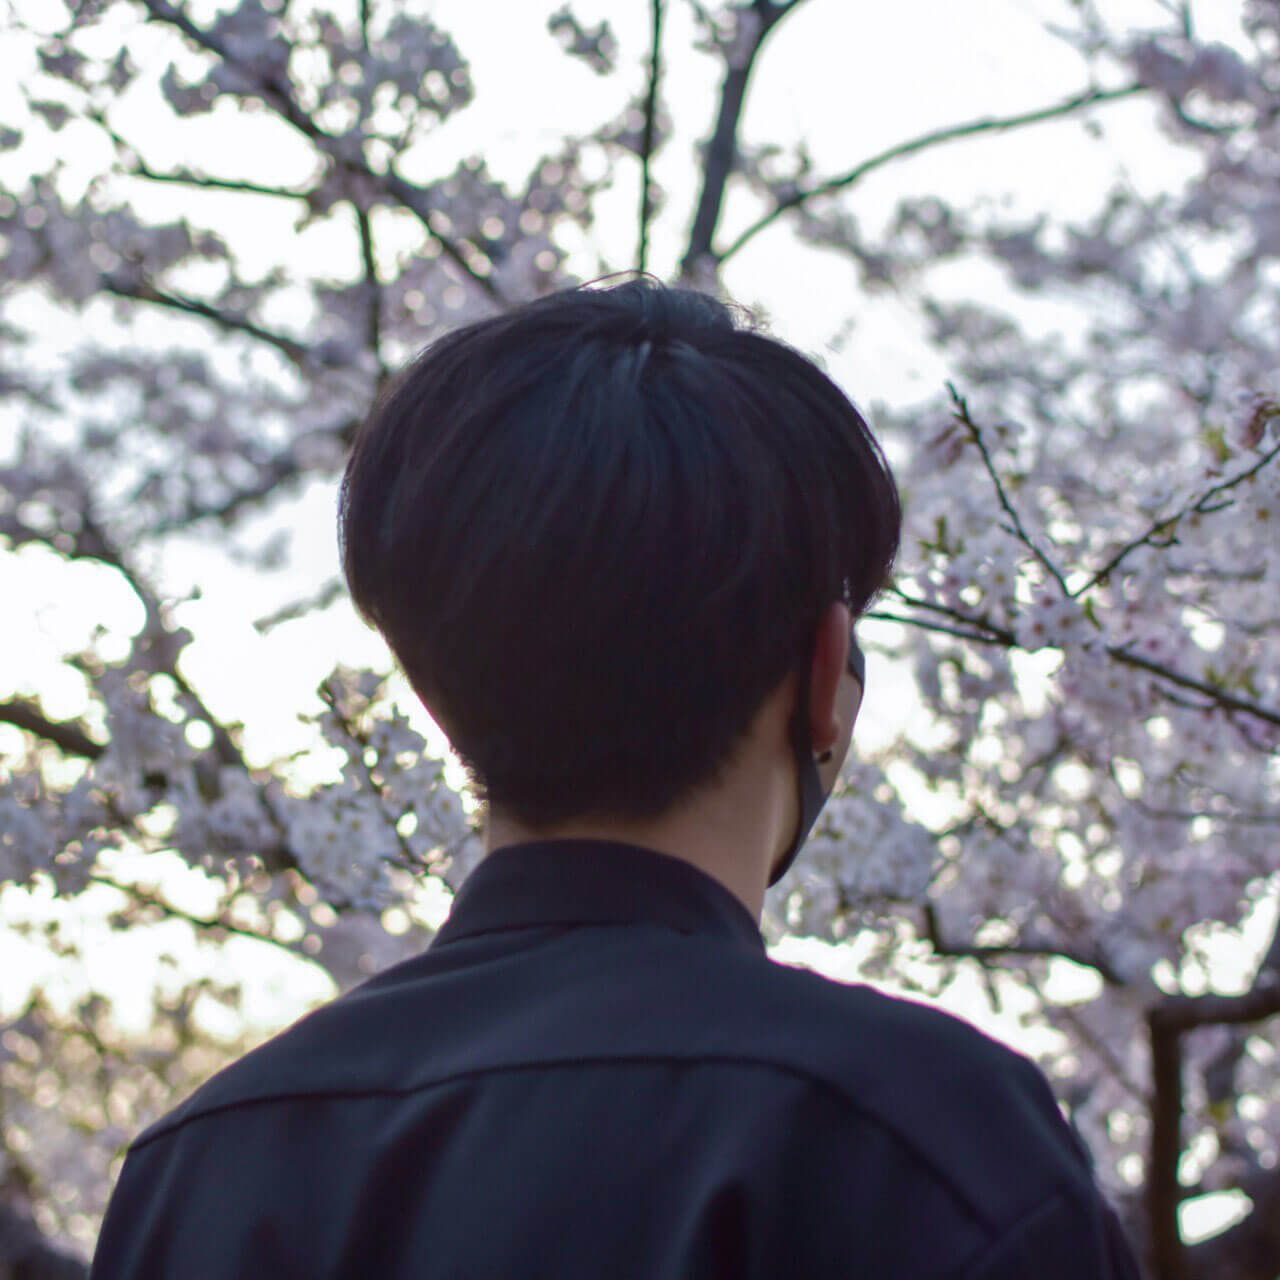 "〈ROOFTOP〉所属のShun Maruno、原島""ど真ん中""宙芳&GAPPERを客演に迎えた新曲「TOKYO ALARM」をリリース music200925-shunmaruno-2"